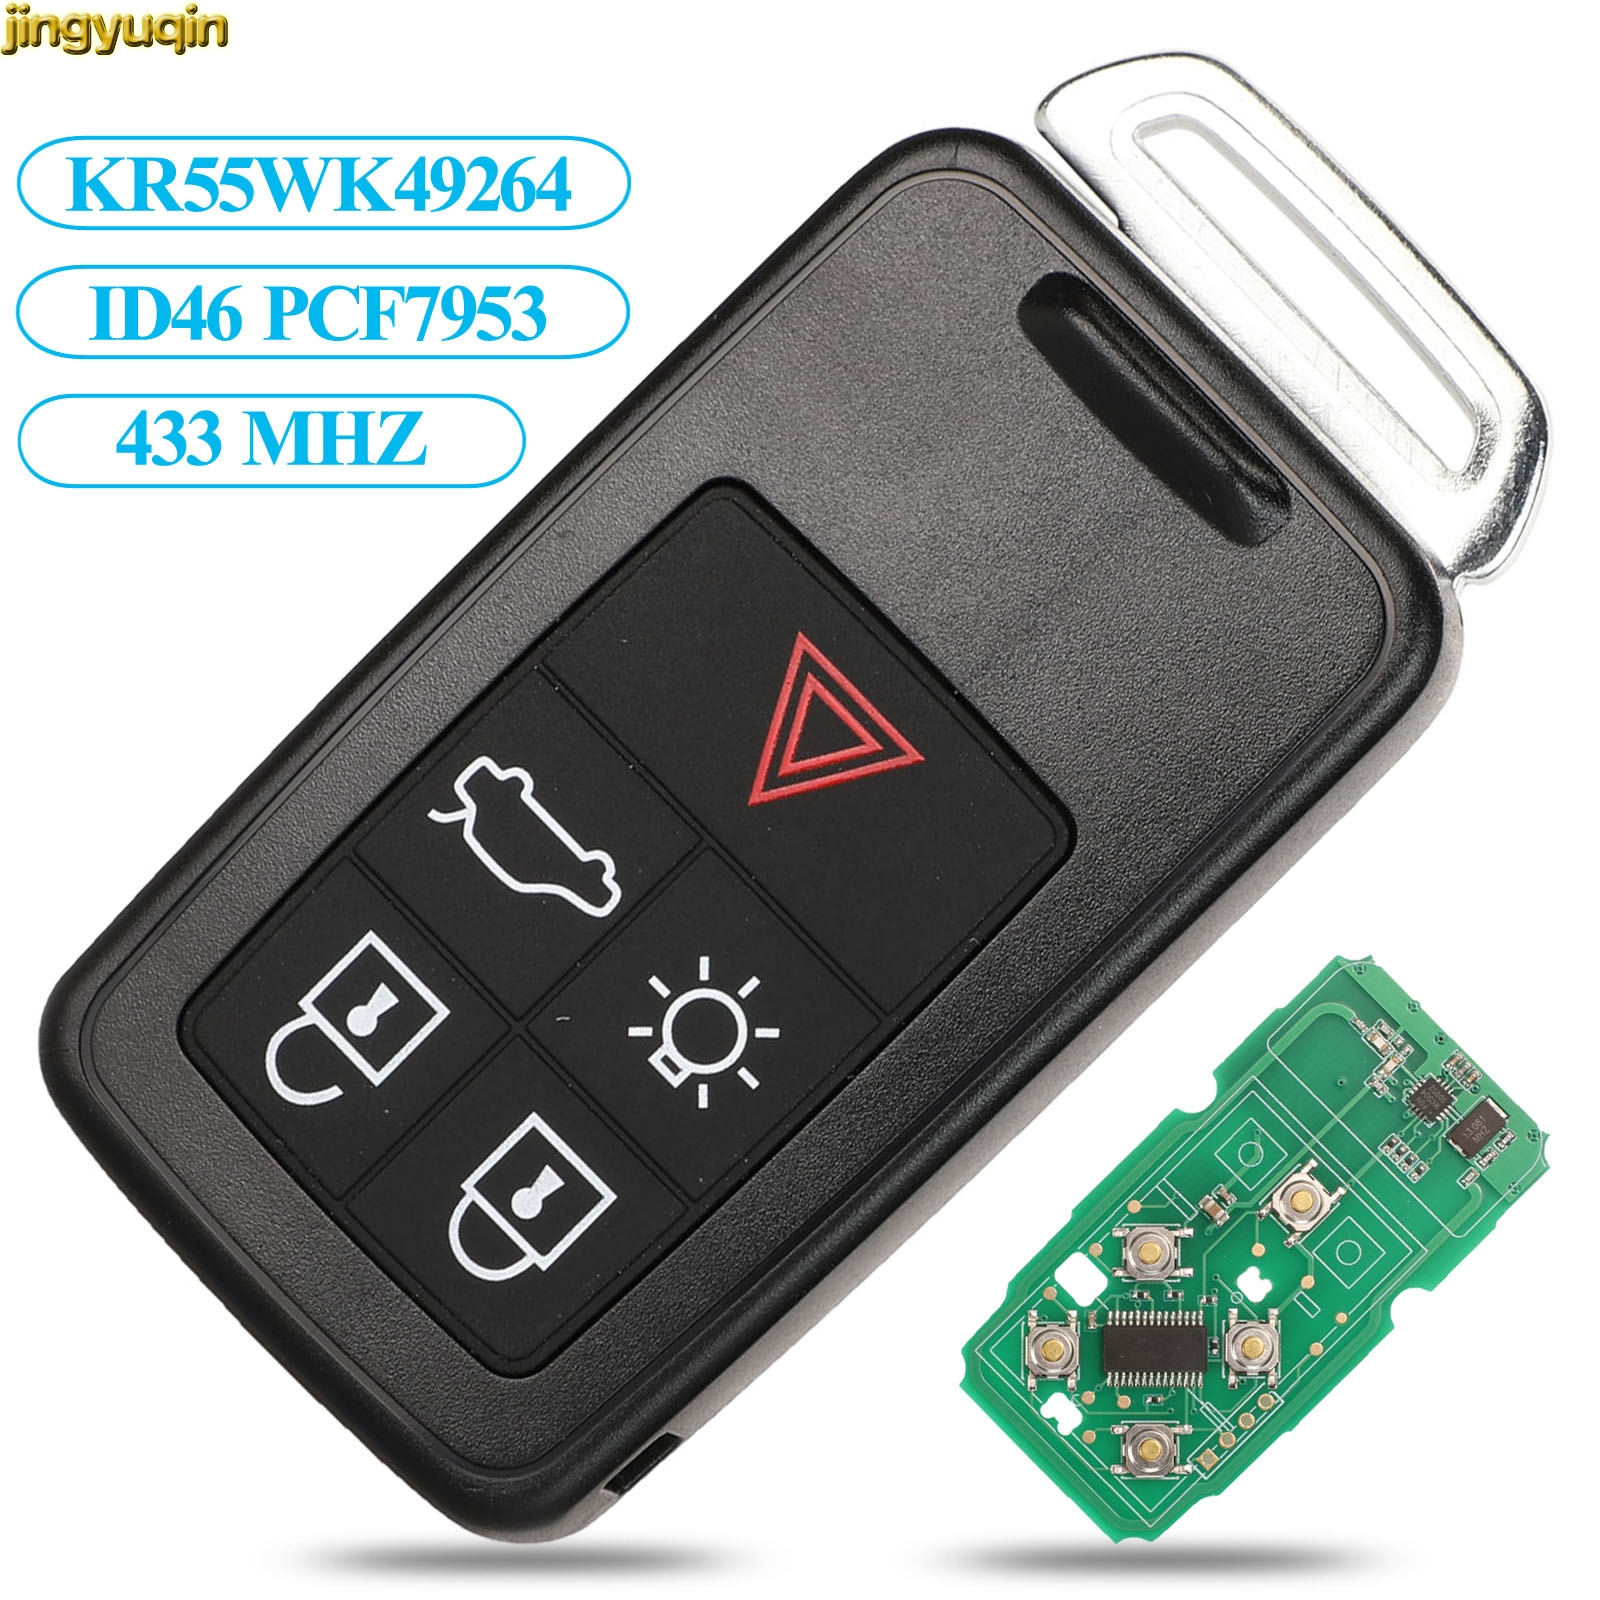 Jingyuqin дистанционный ключ автомобиля 434 МГц ID46 чип для Volvo KYDZ S60 S60L S80 V40 V60 XC60 XC70 5 кнопочный умный ключ